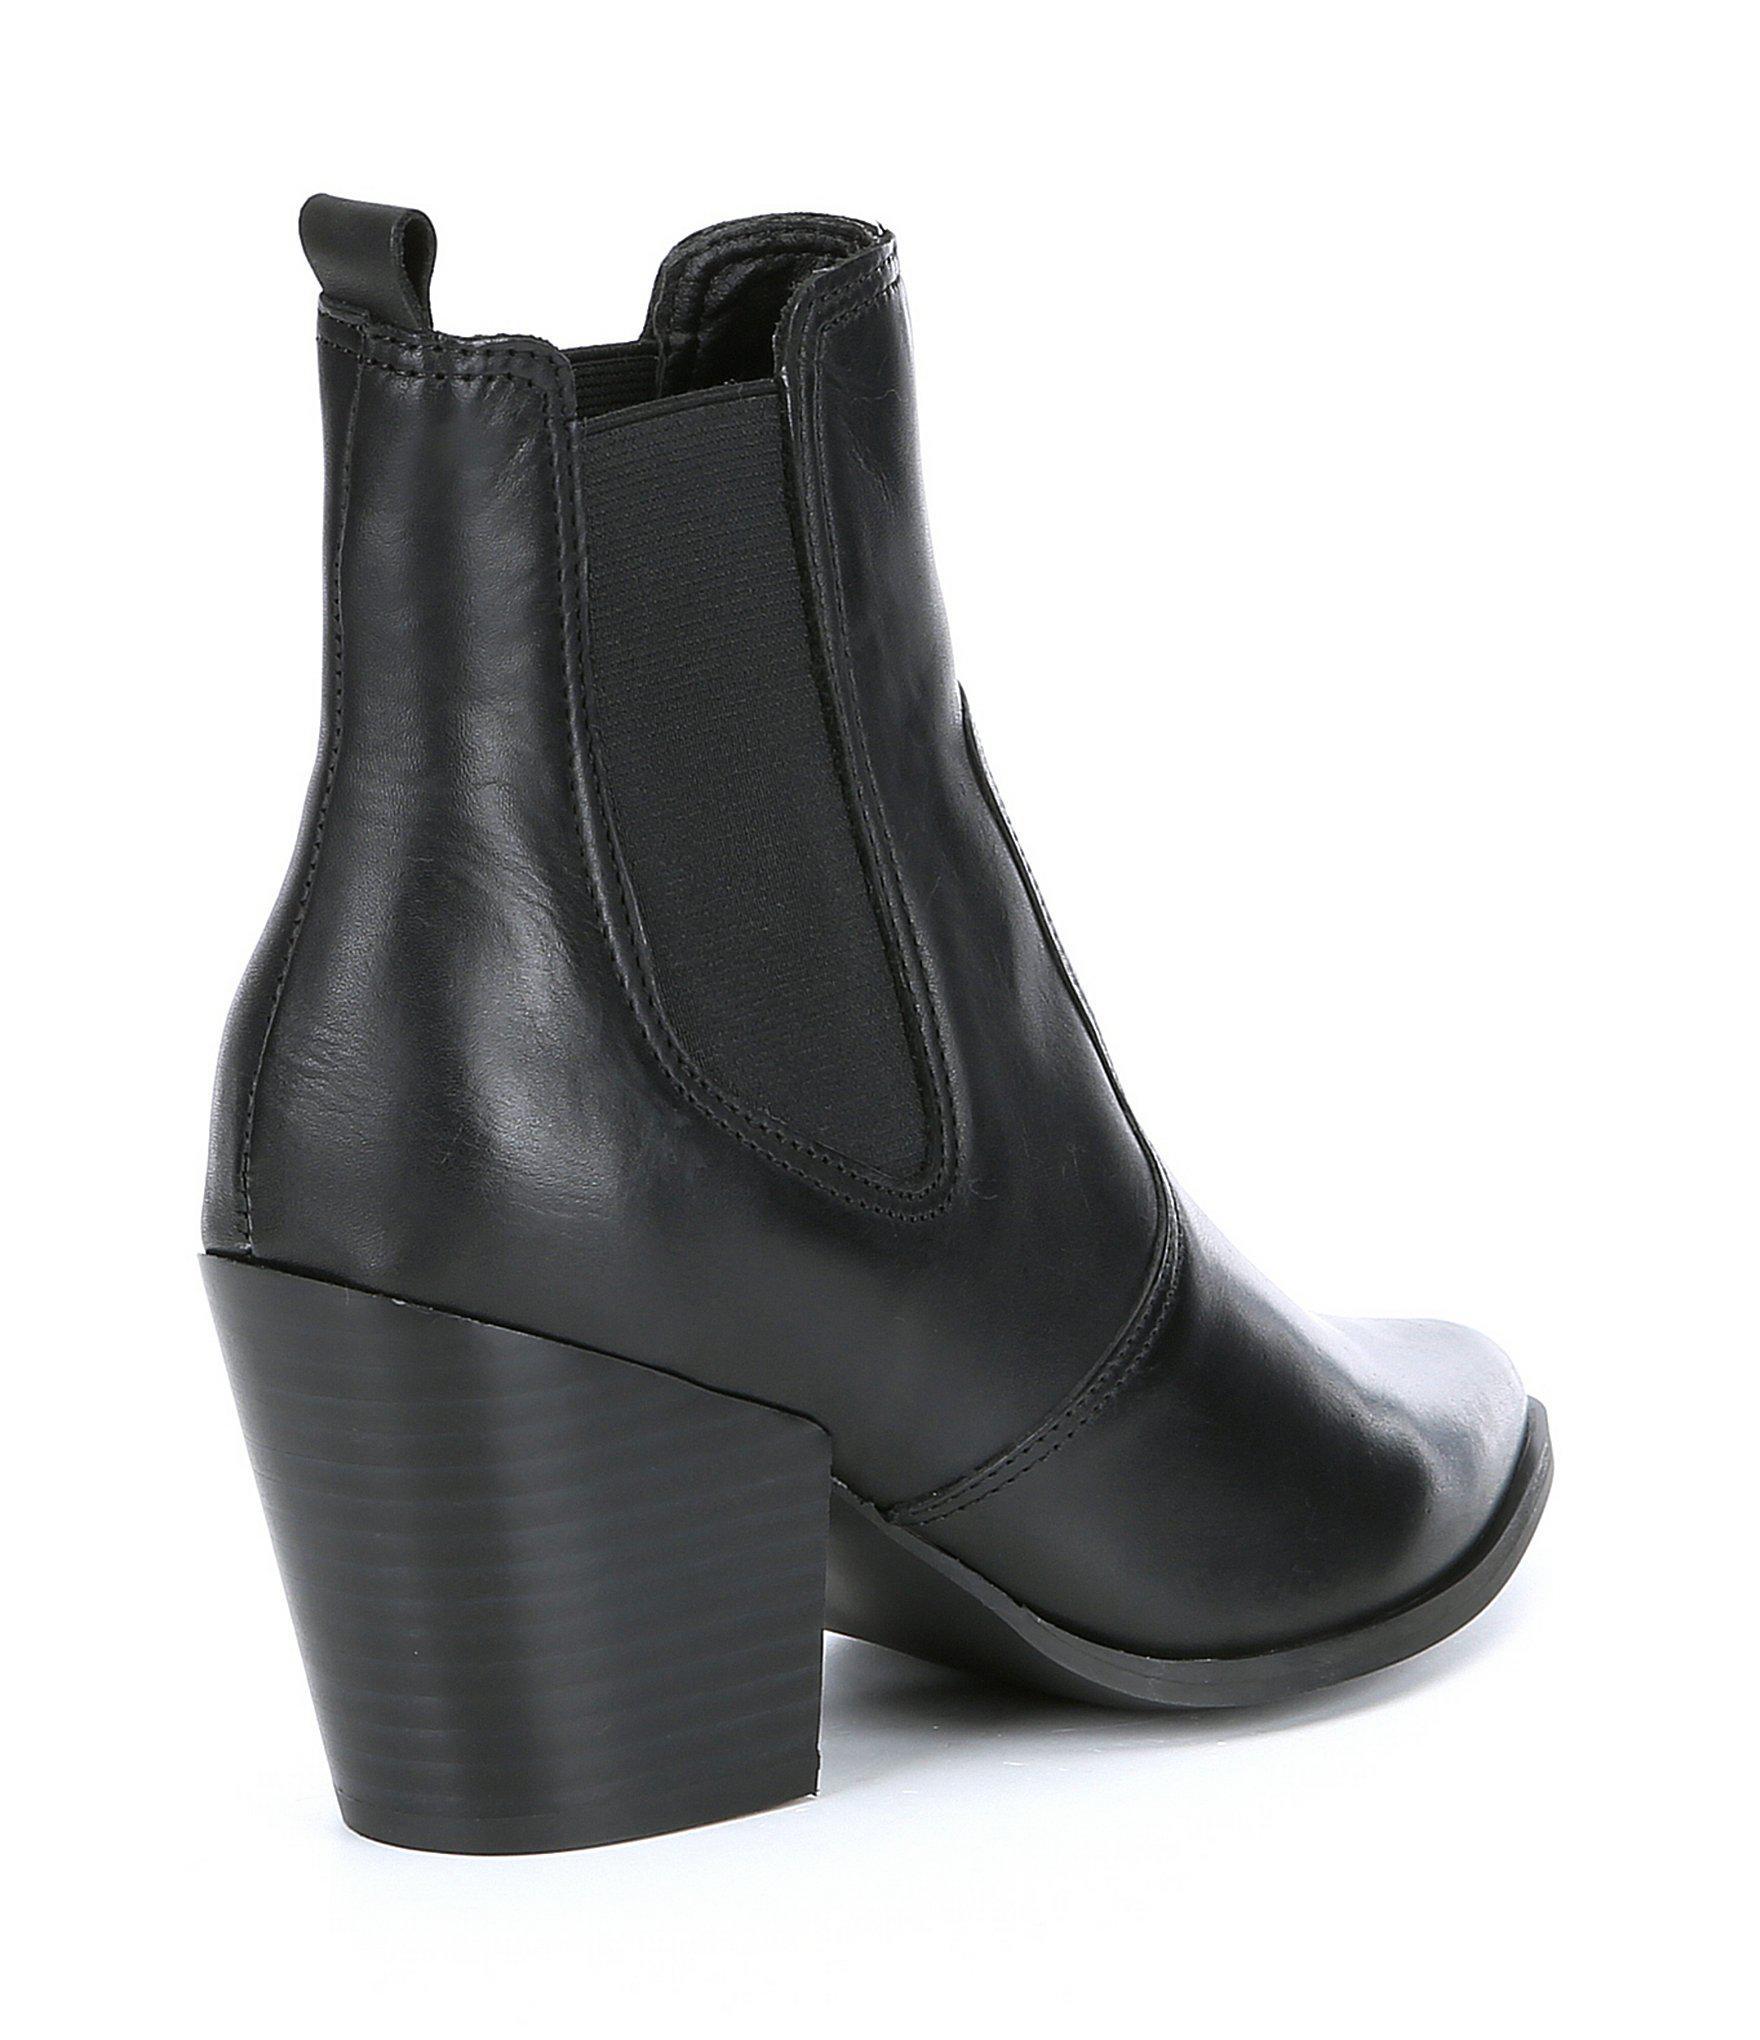 0b81df752aa Lyst - Steve Madden Patricia Leather Block Heel Booties in Black